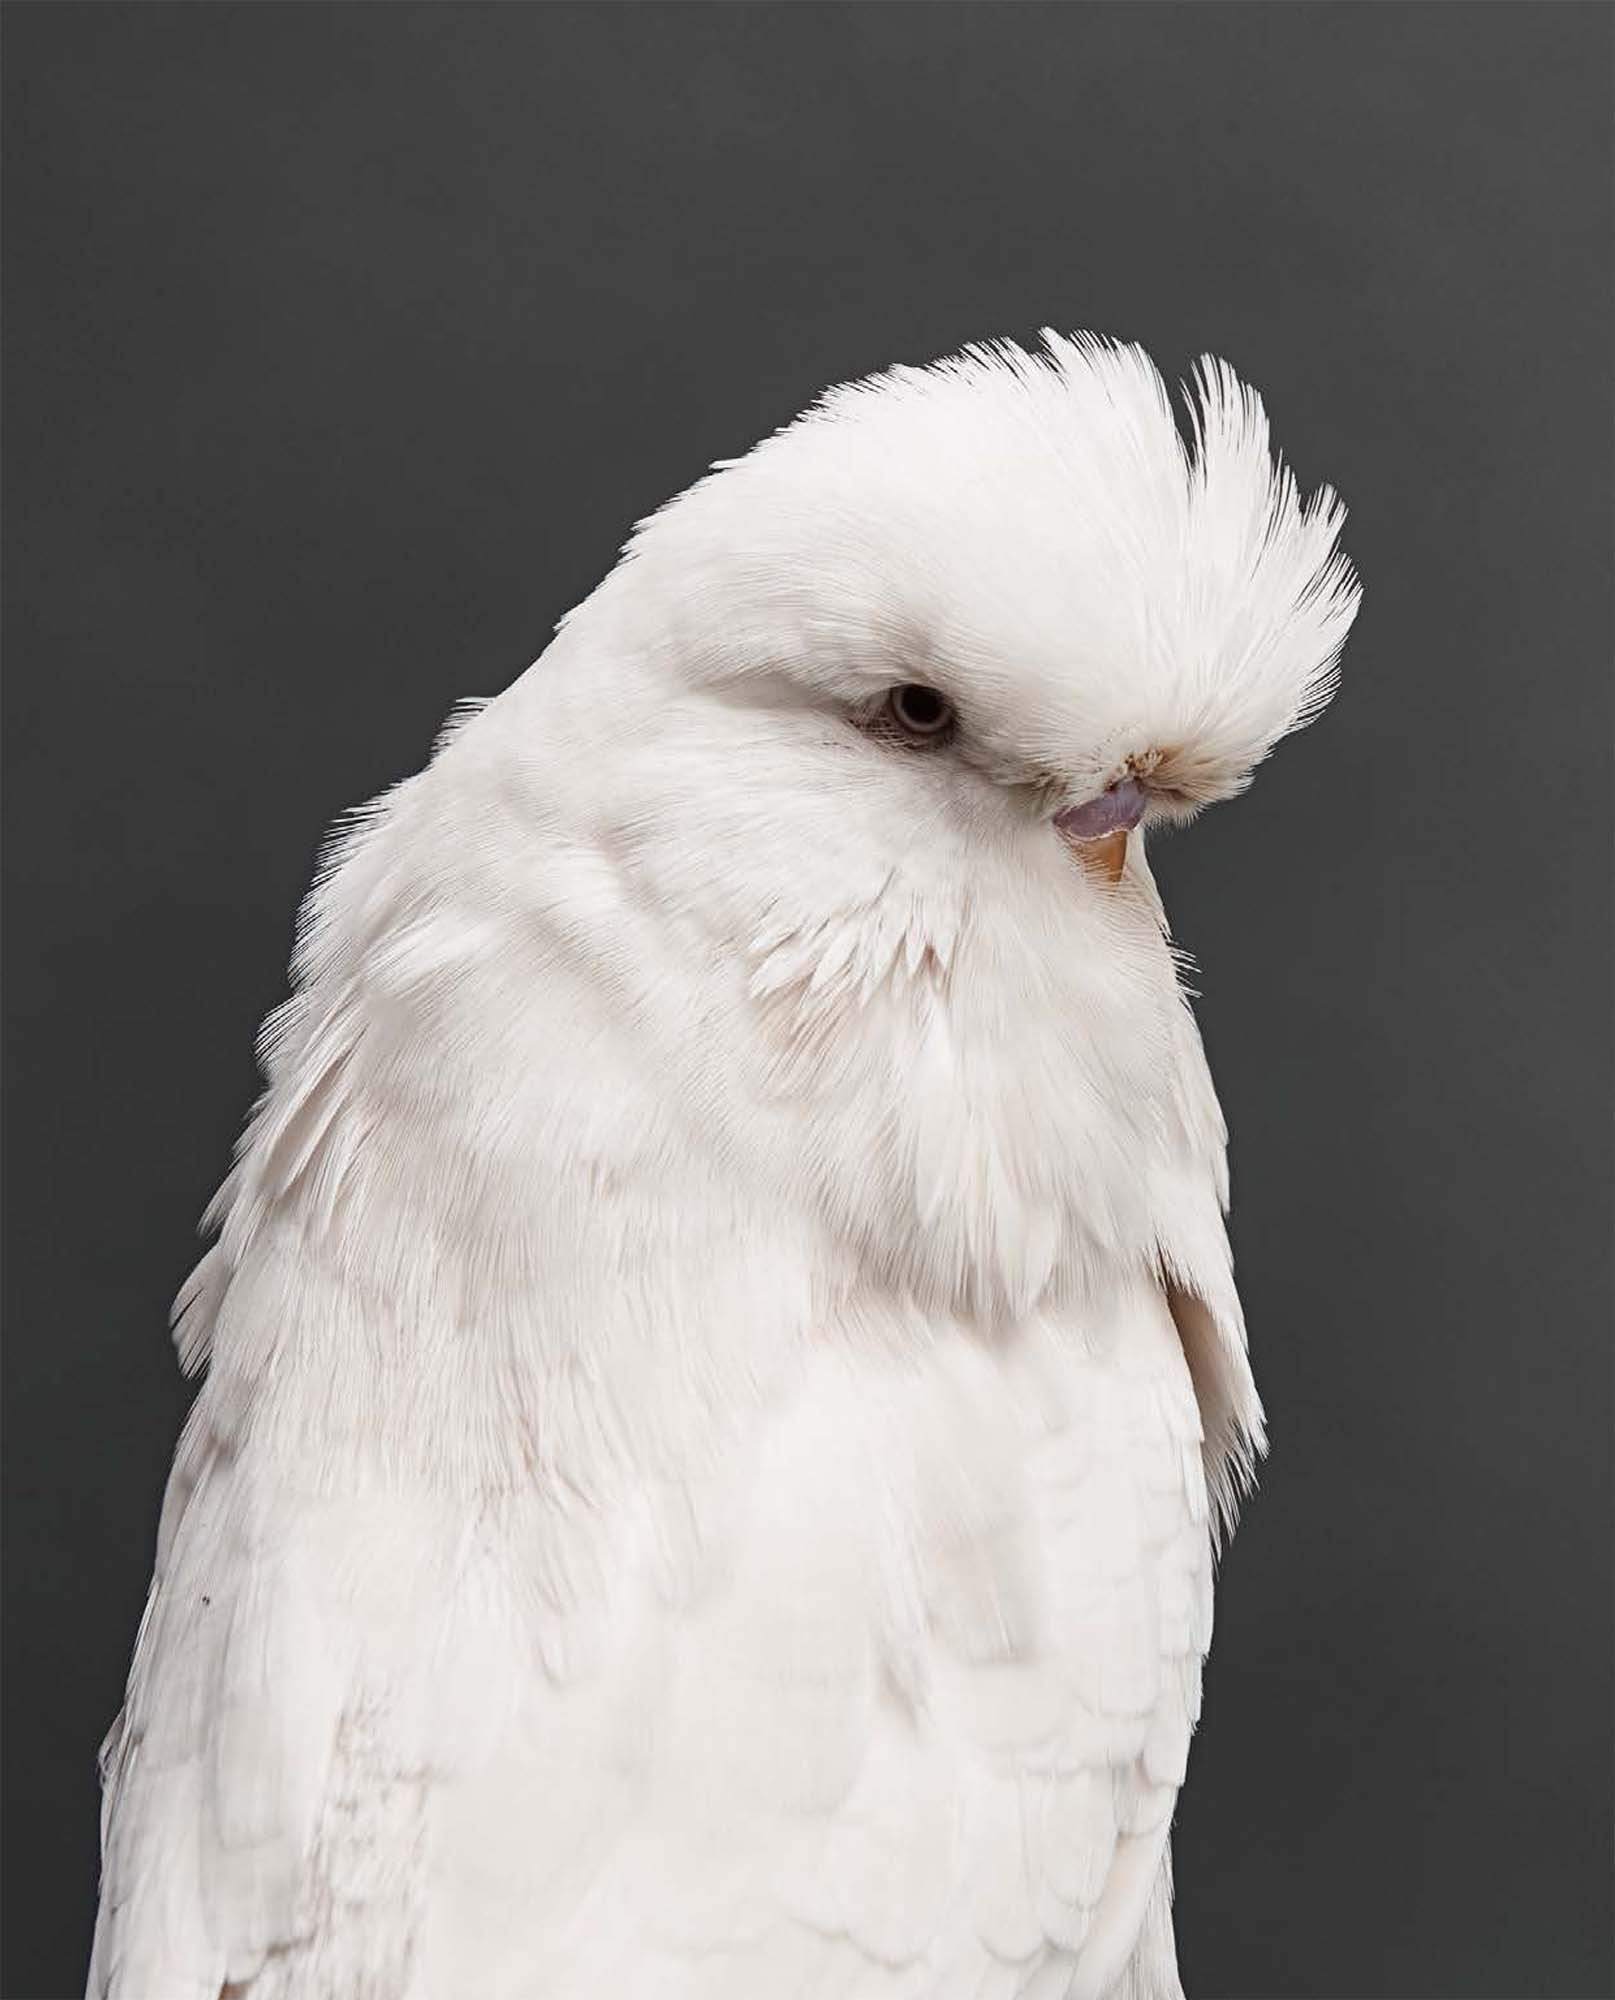 BIRD Gary Heery Book-completemmockup-136.jpg